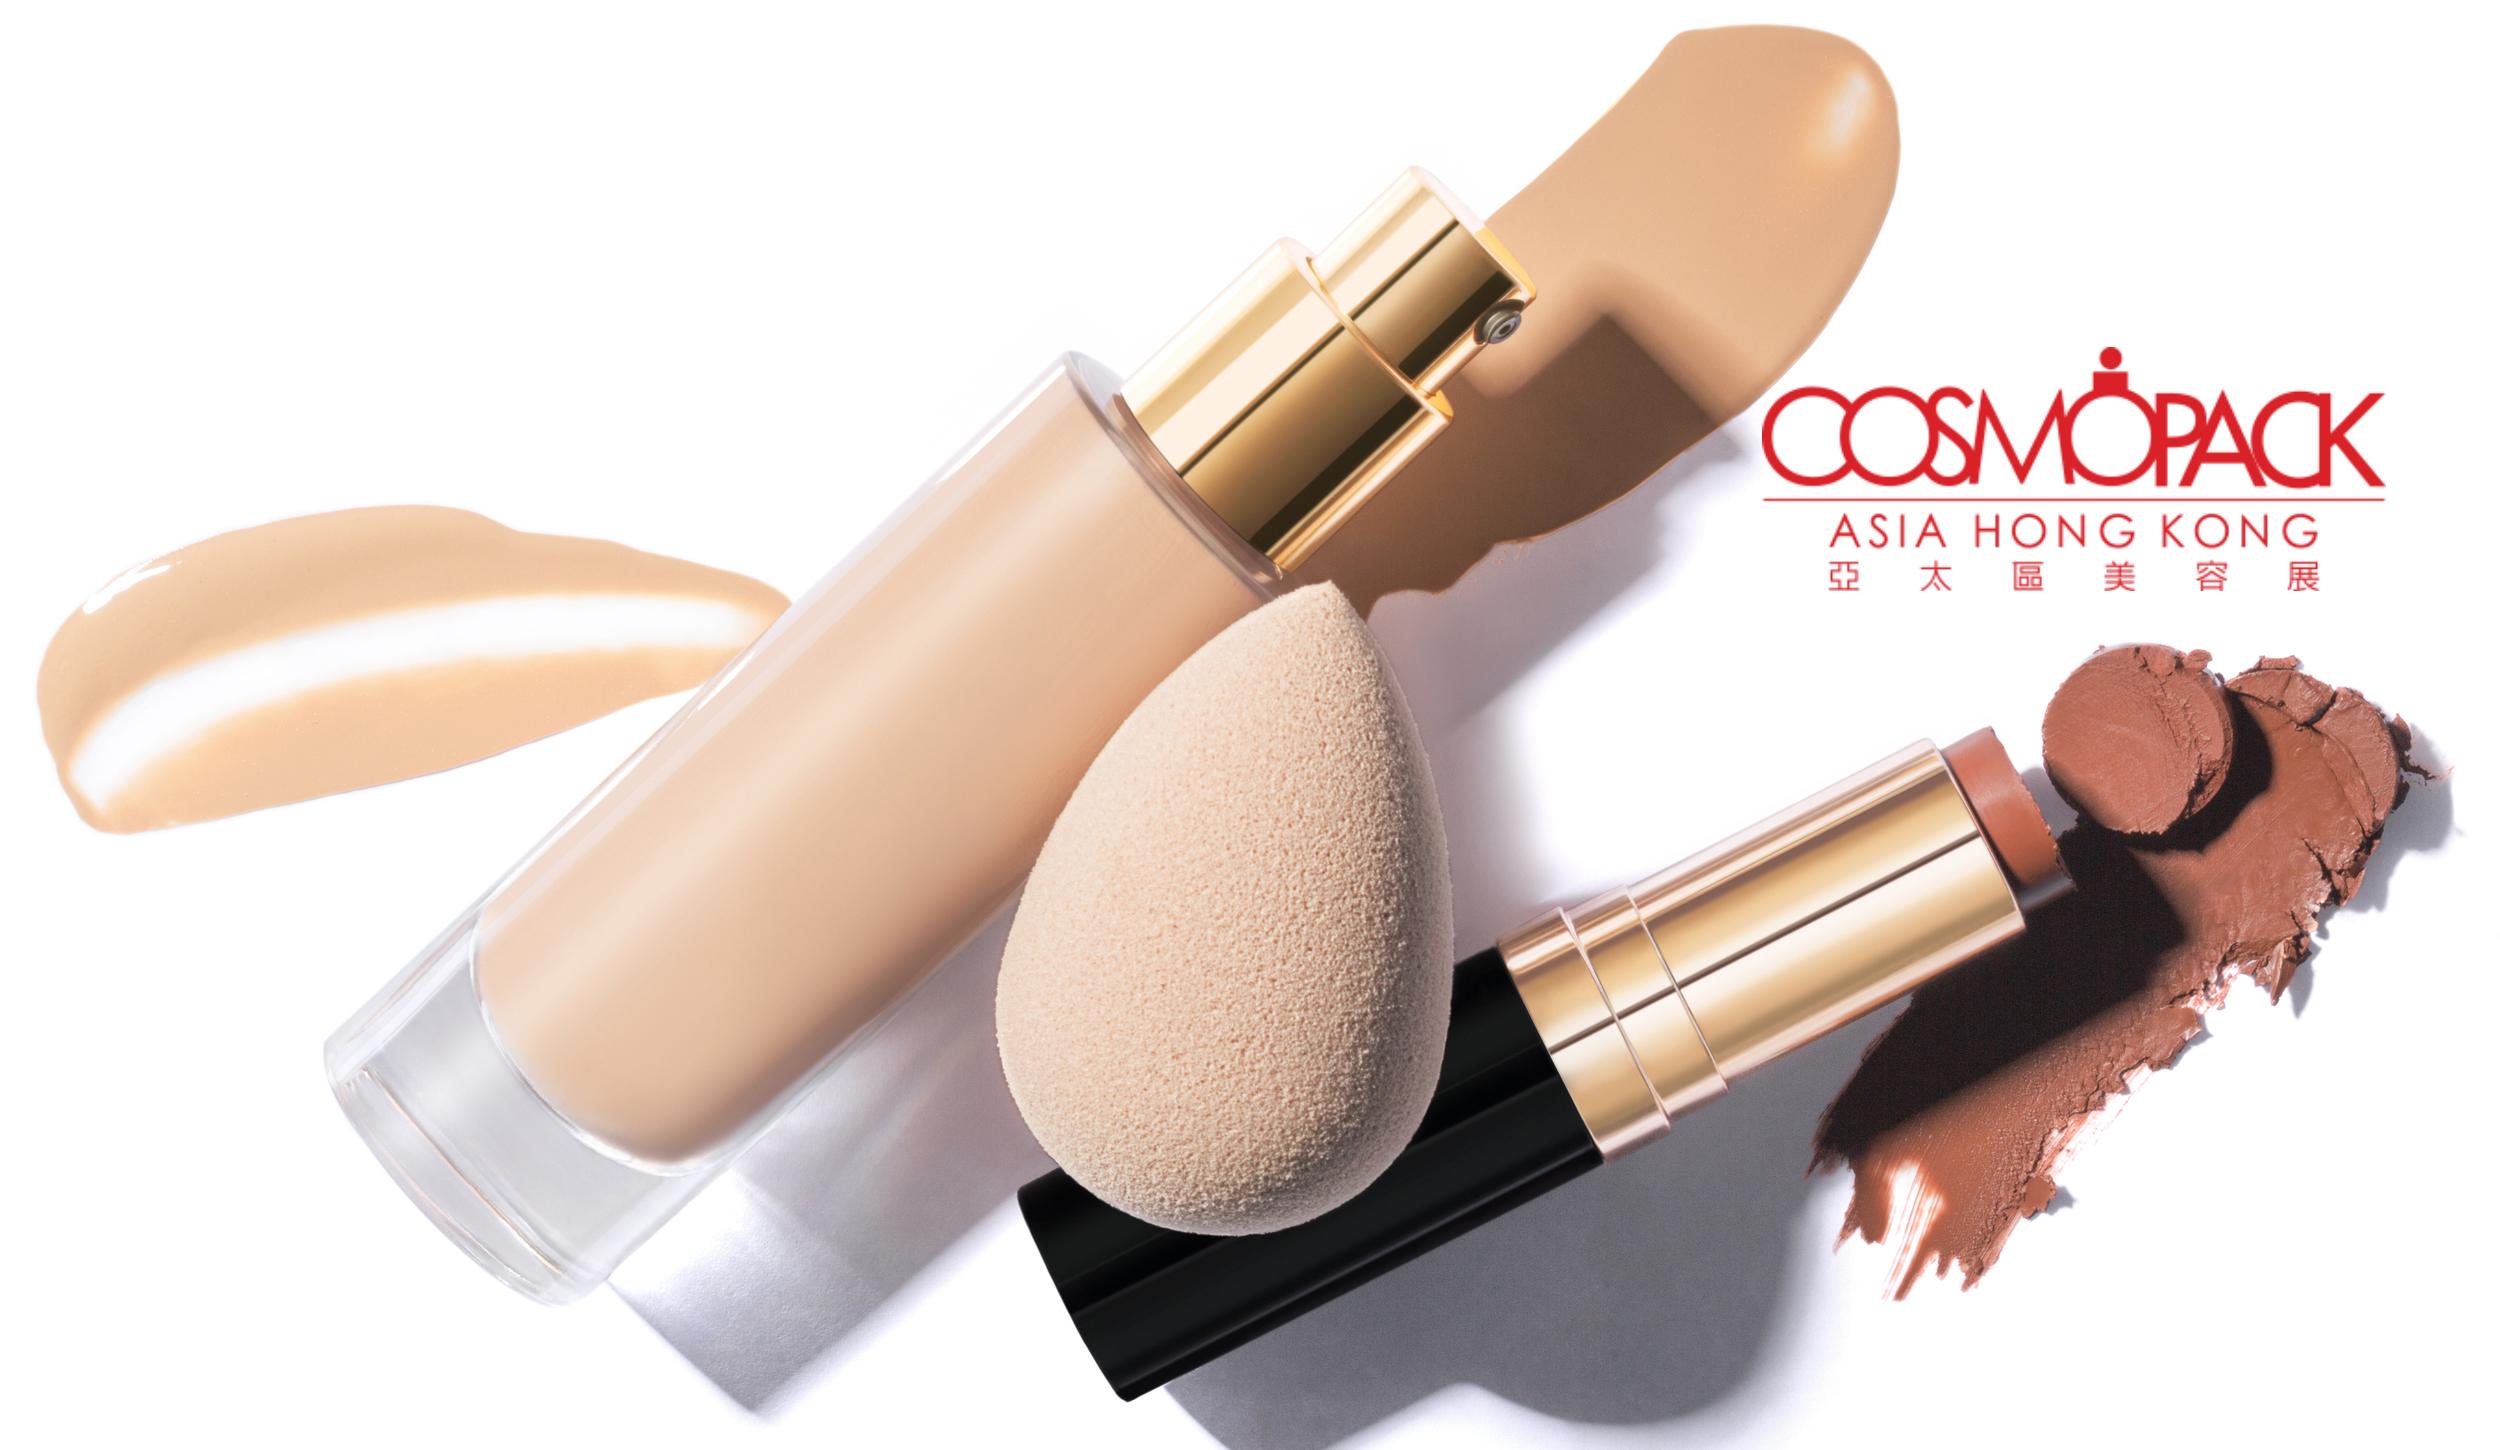 Global Cosmetics Cosmetic Manufacturer CosmoProf 2019